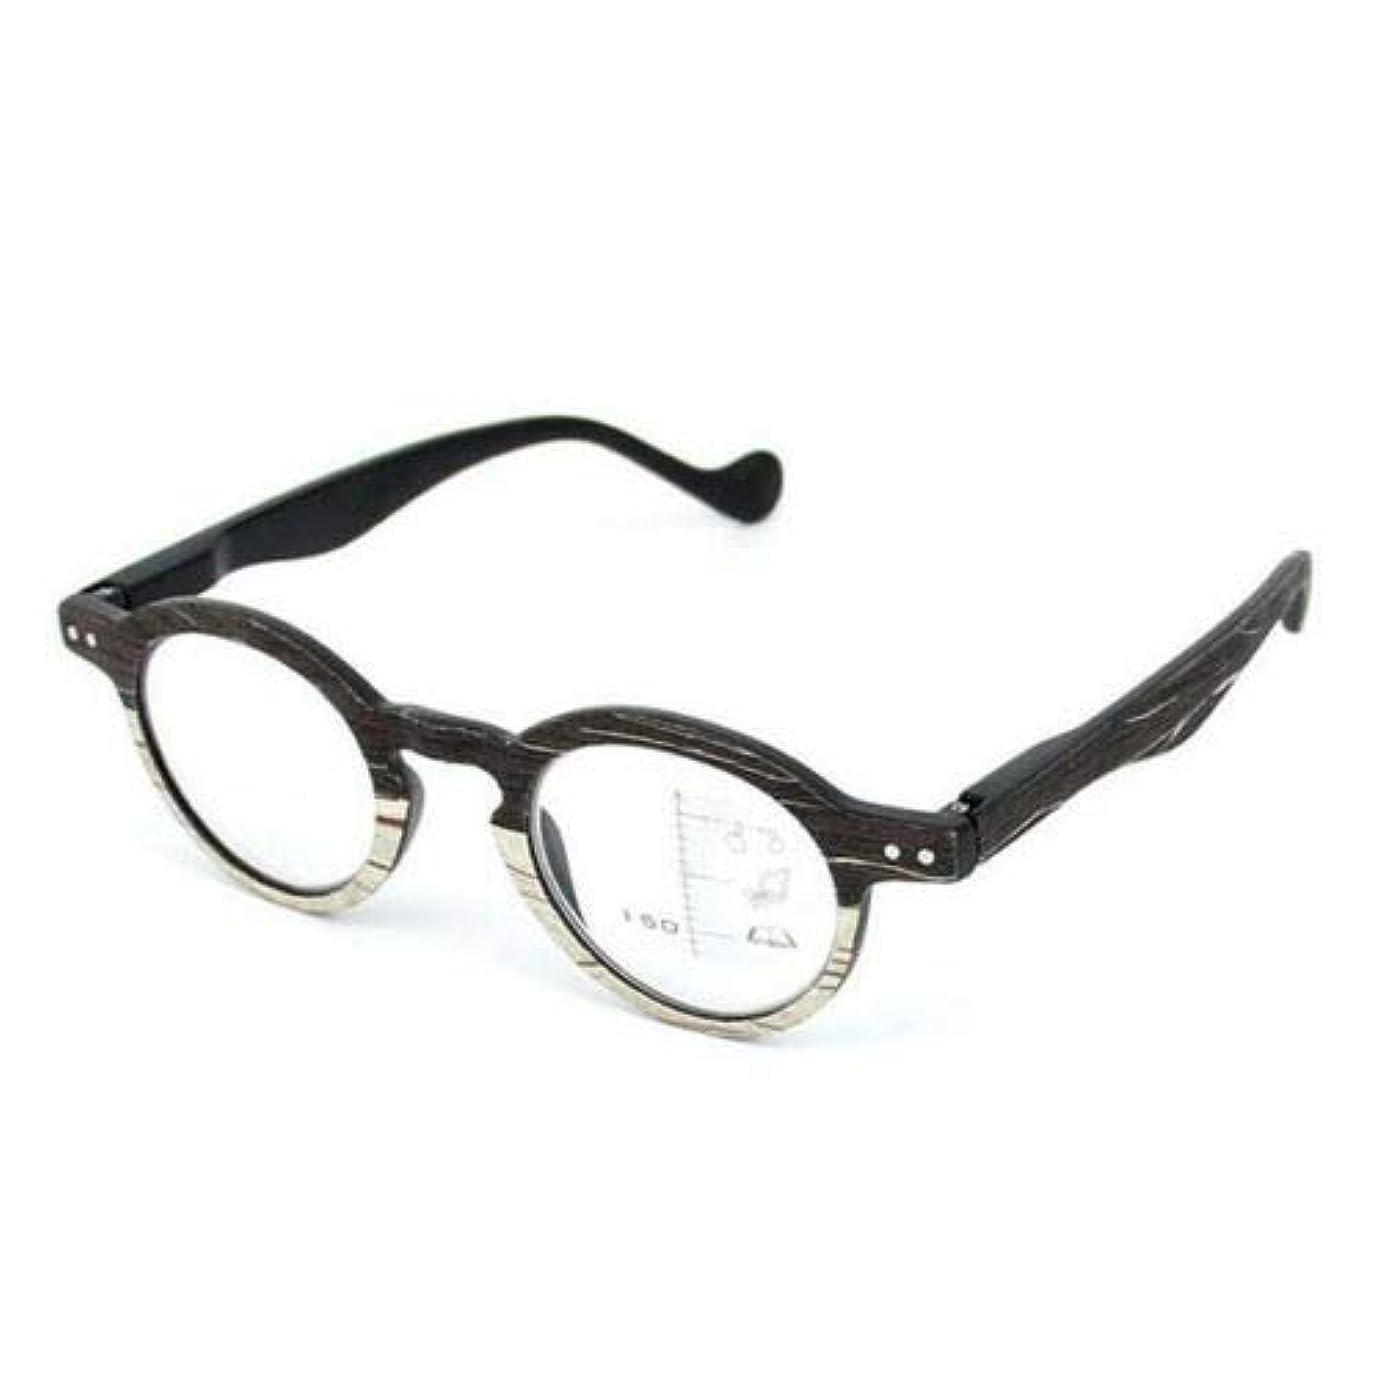 FidgetGear ウッドグレインプログレッシブ老眼鏡レトロマルチフォーカス女性男性眼鏡 ブラック